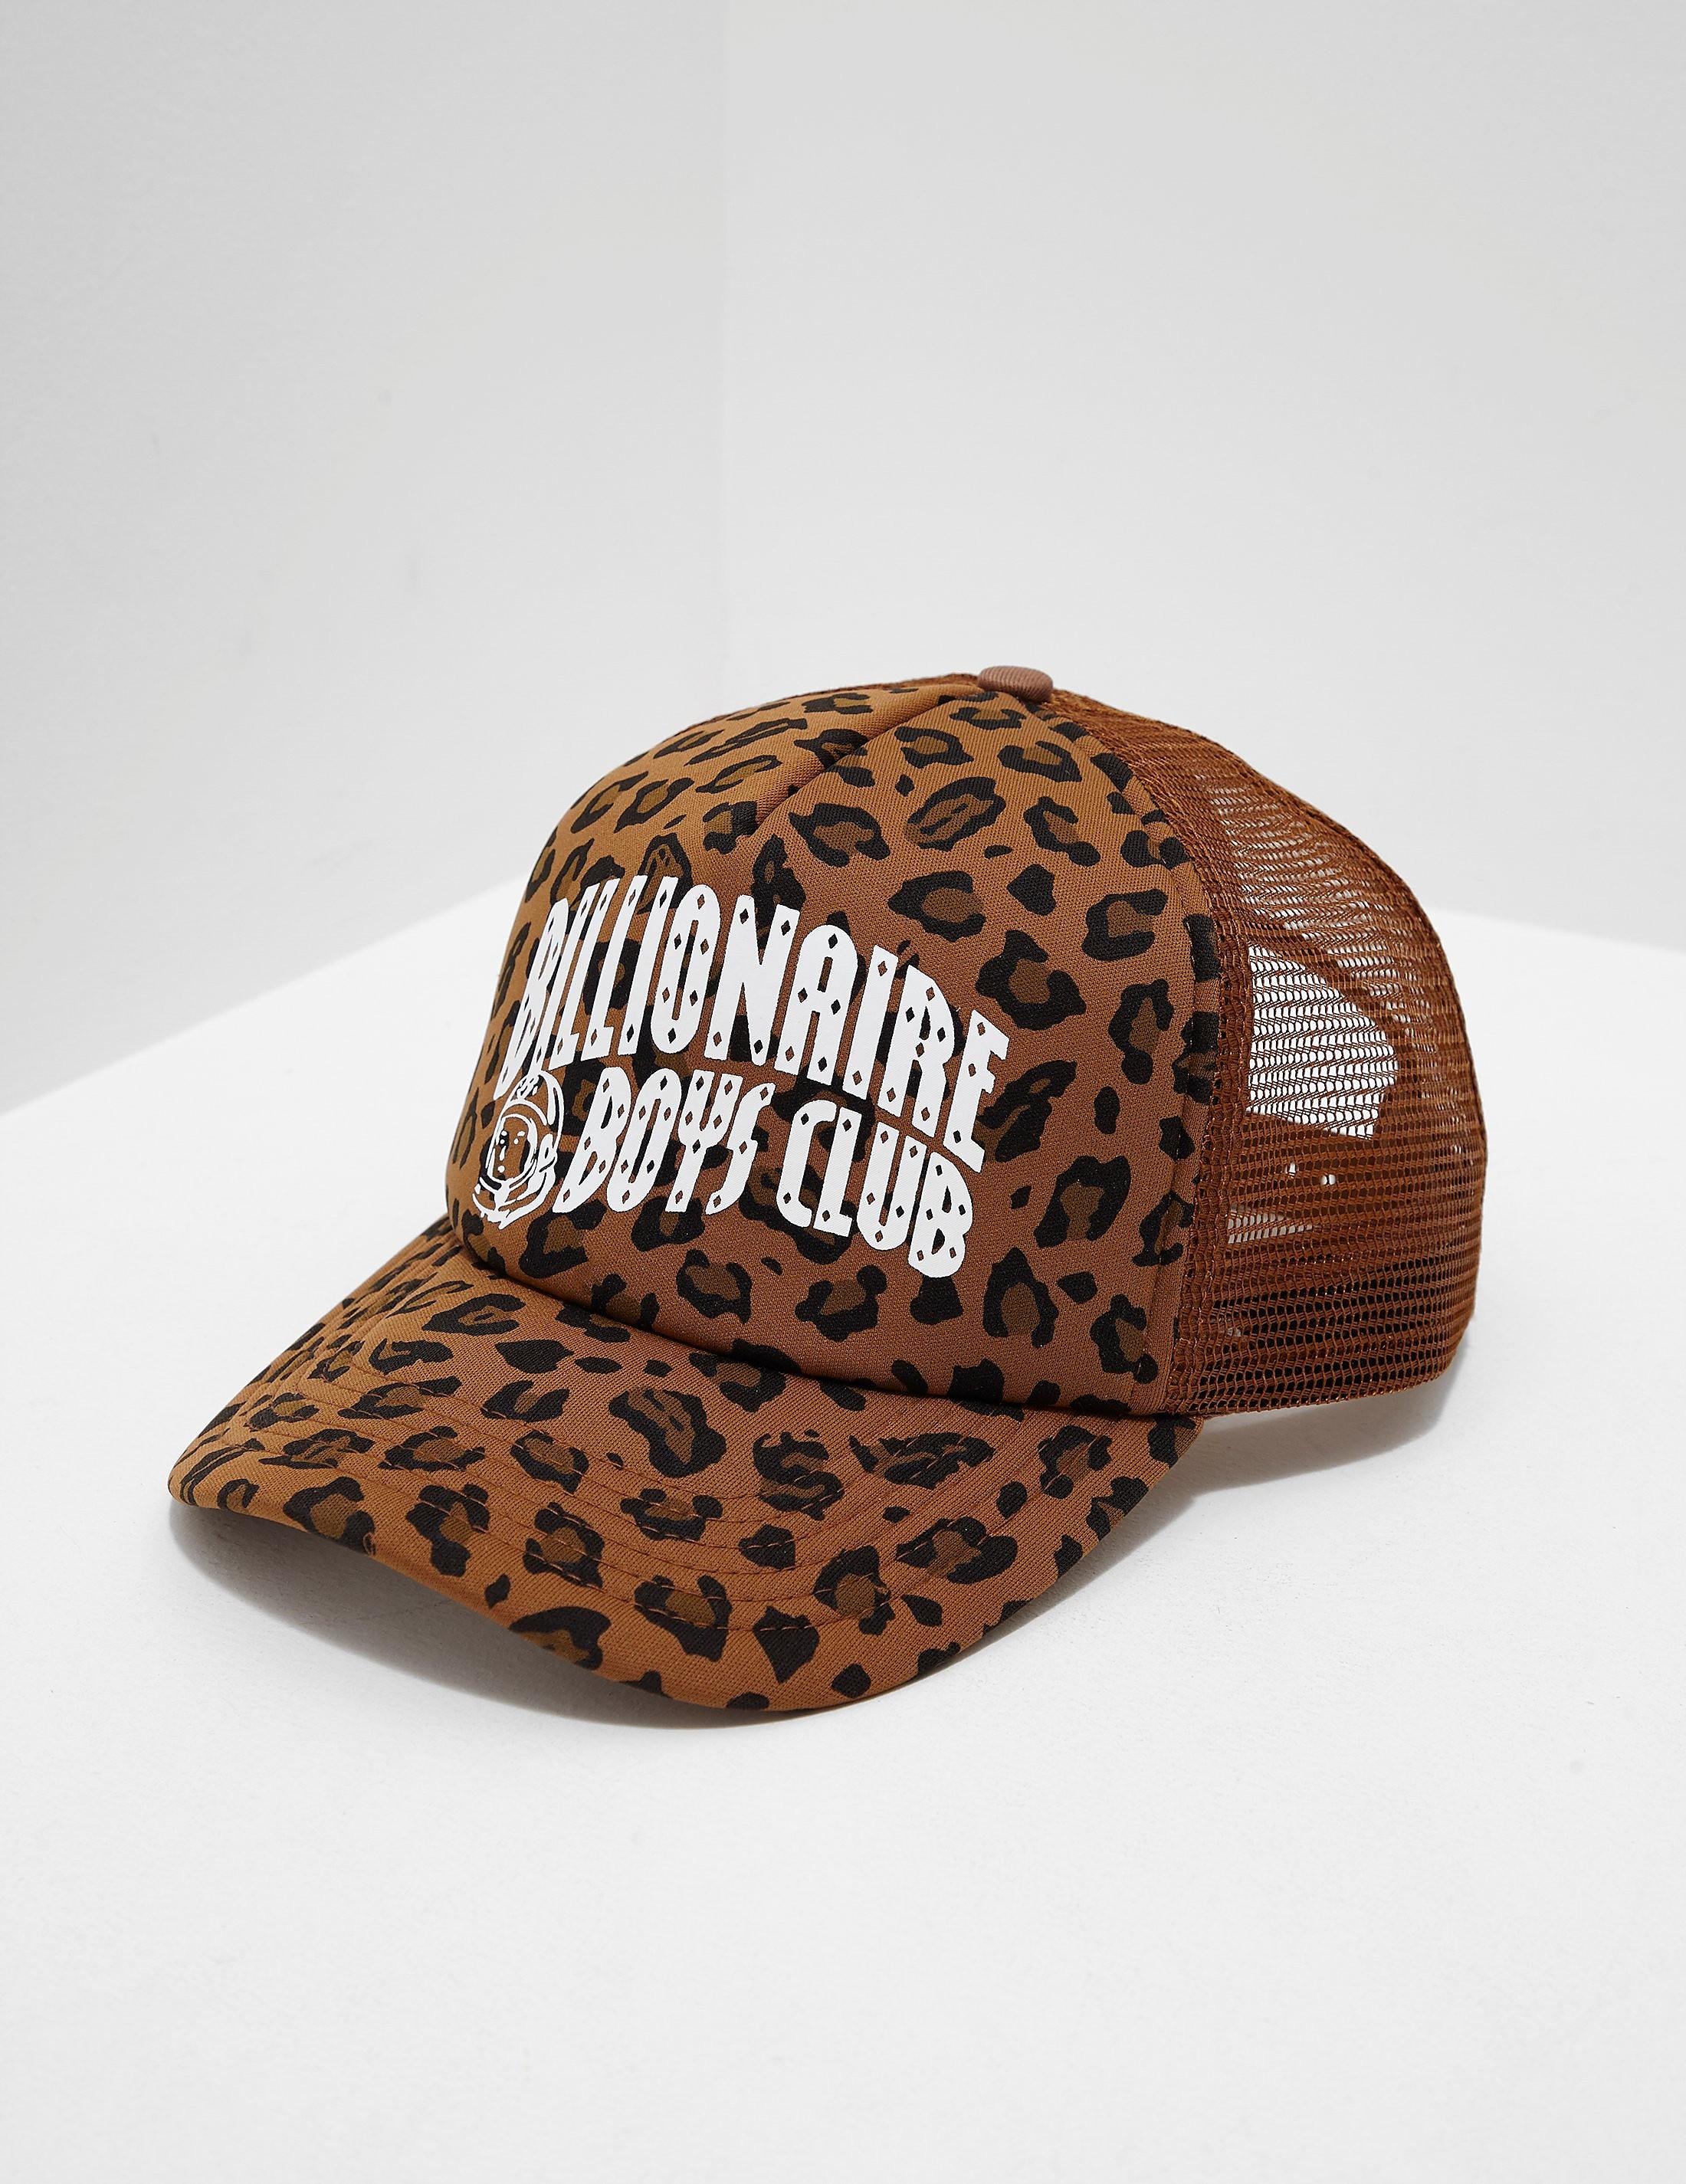 d1489e6d71d Mens Billionaire Boys Club Leopard Trucker Cap Olive